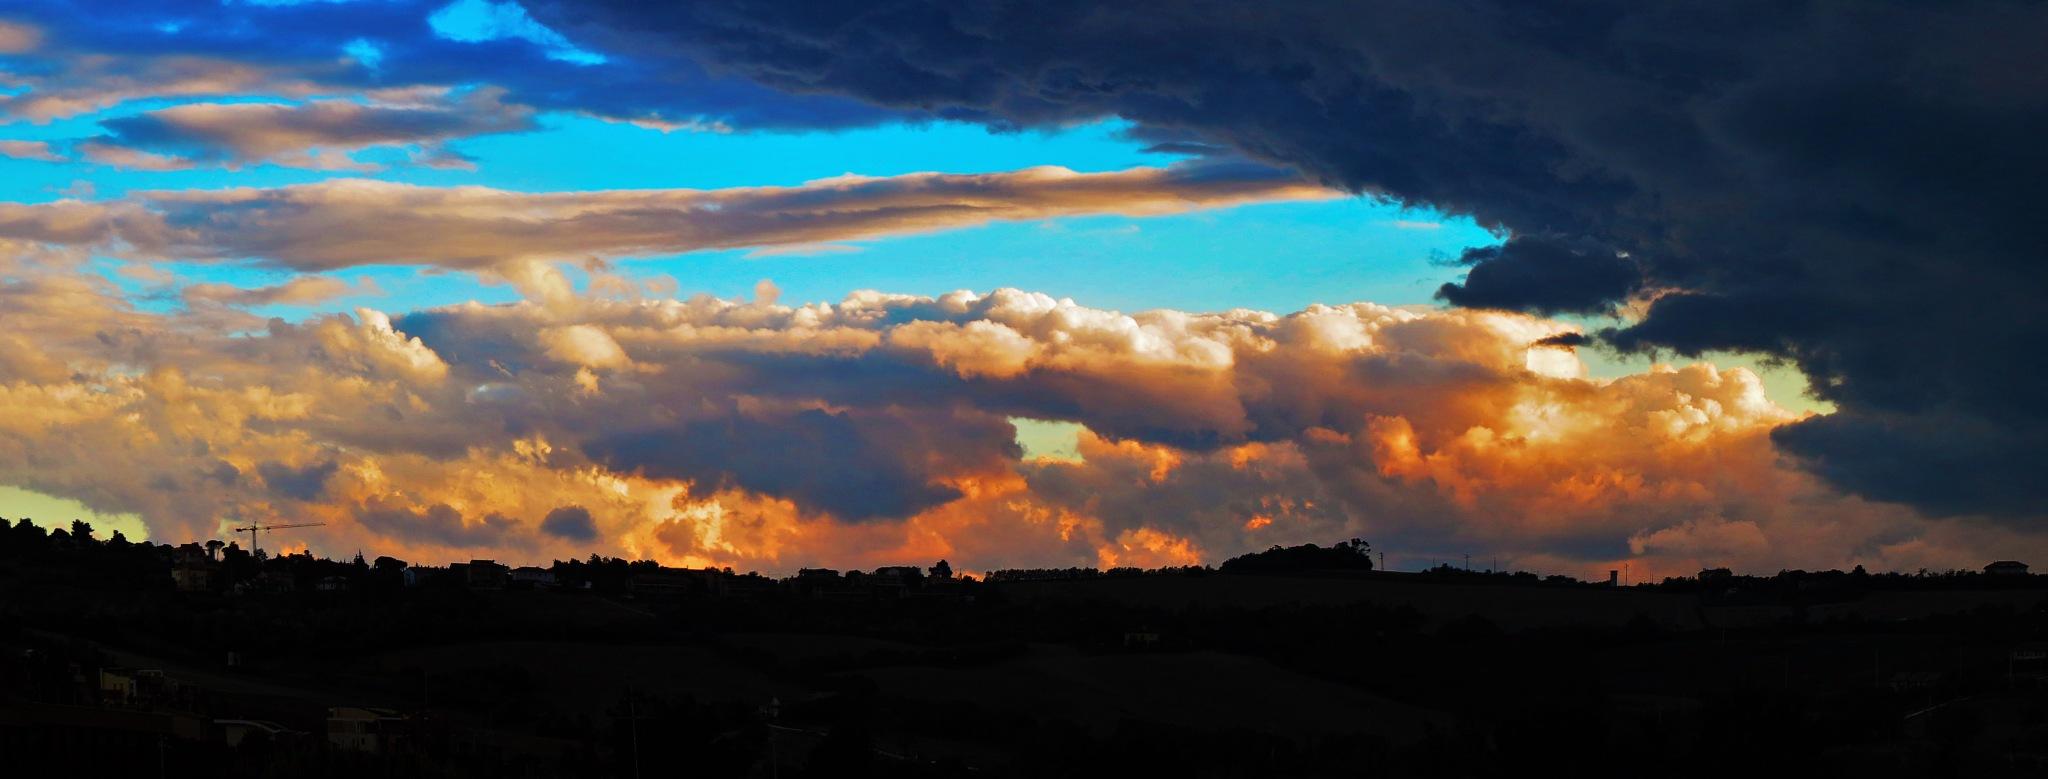 Ancona, Marche, Italy - Storm by Gianni Del Bufalo CC BY-NC-SA by gianni del bufalo